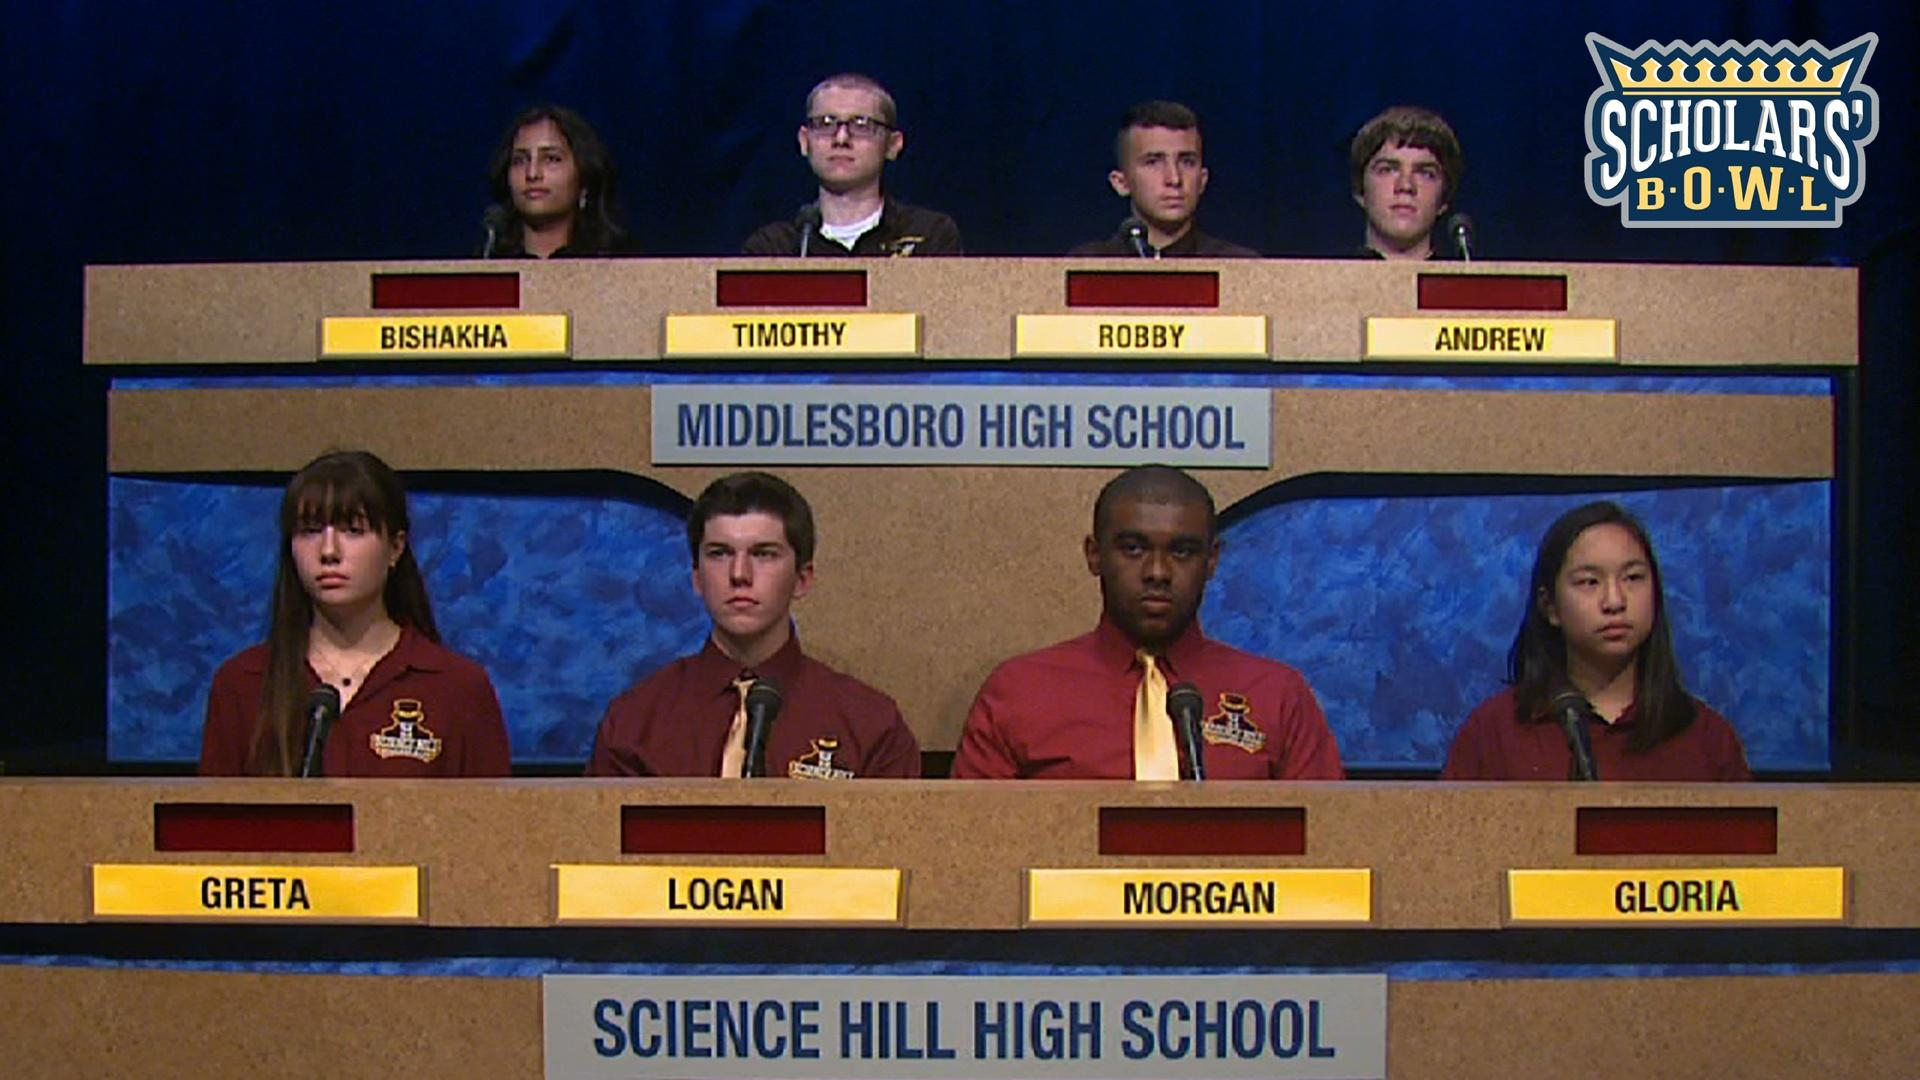 Scholars' Bowl